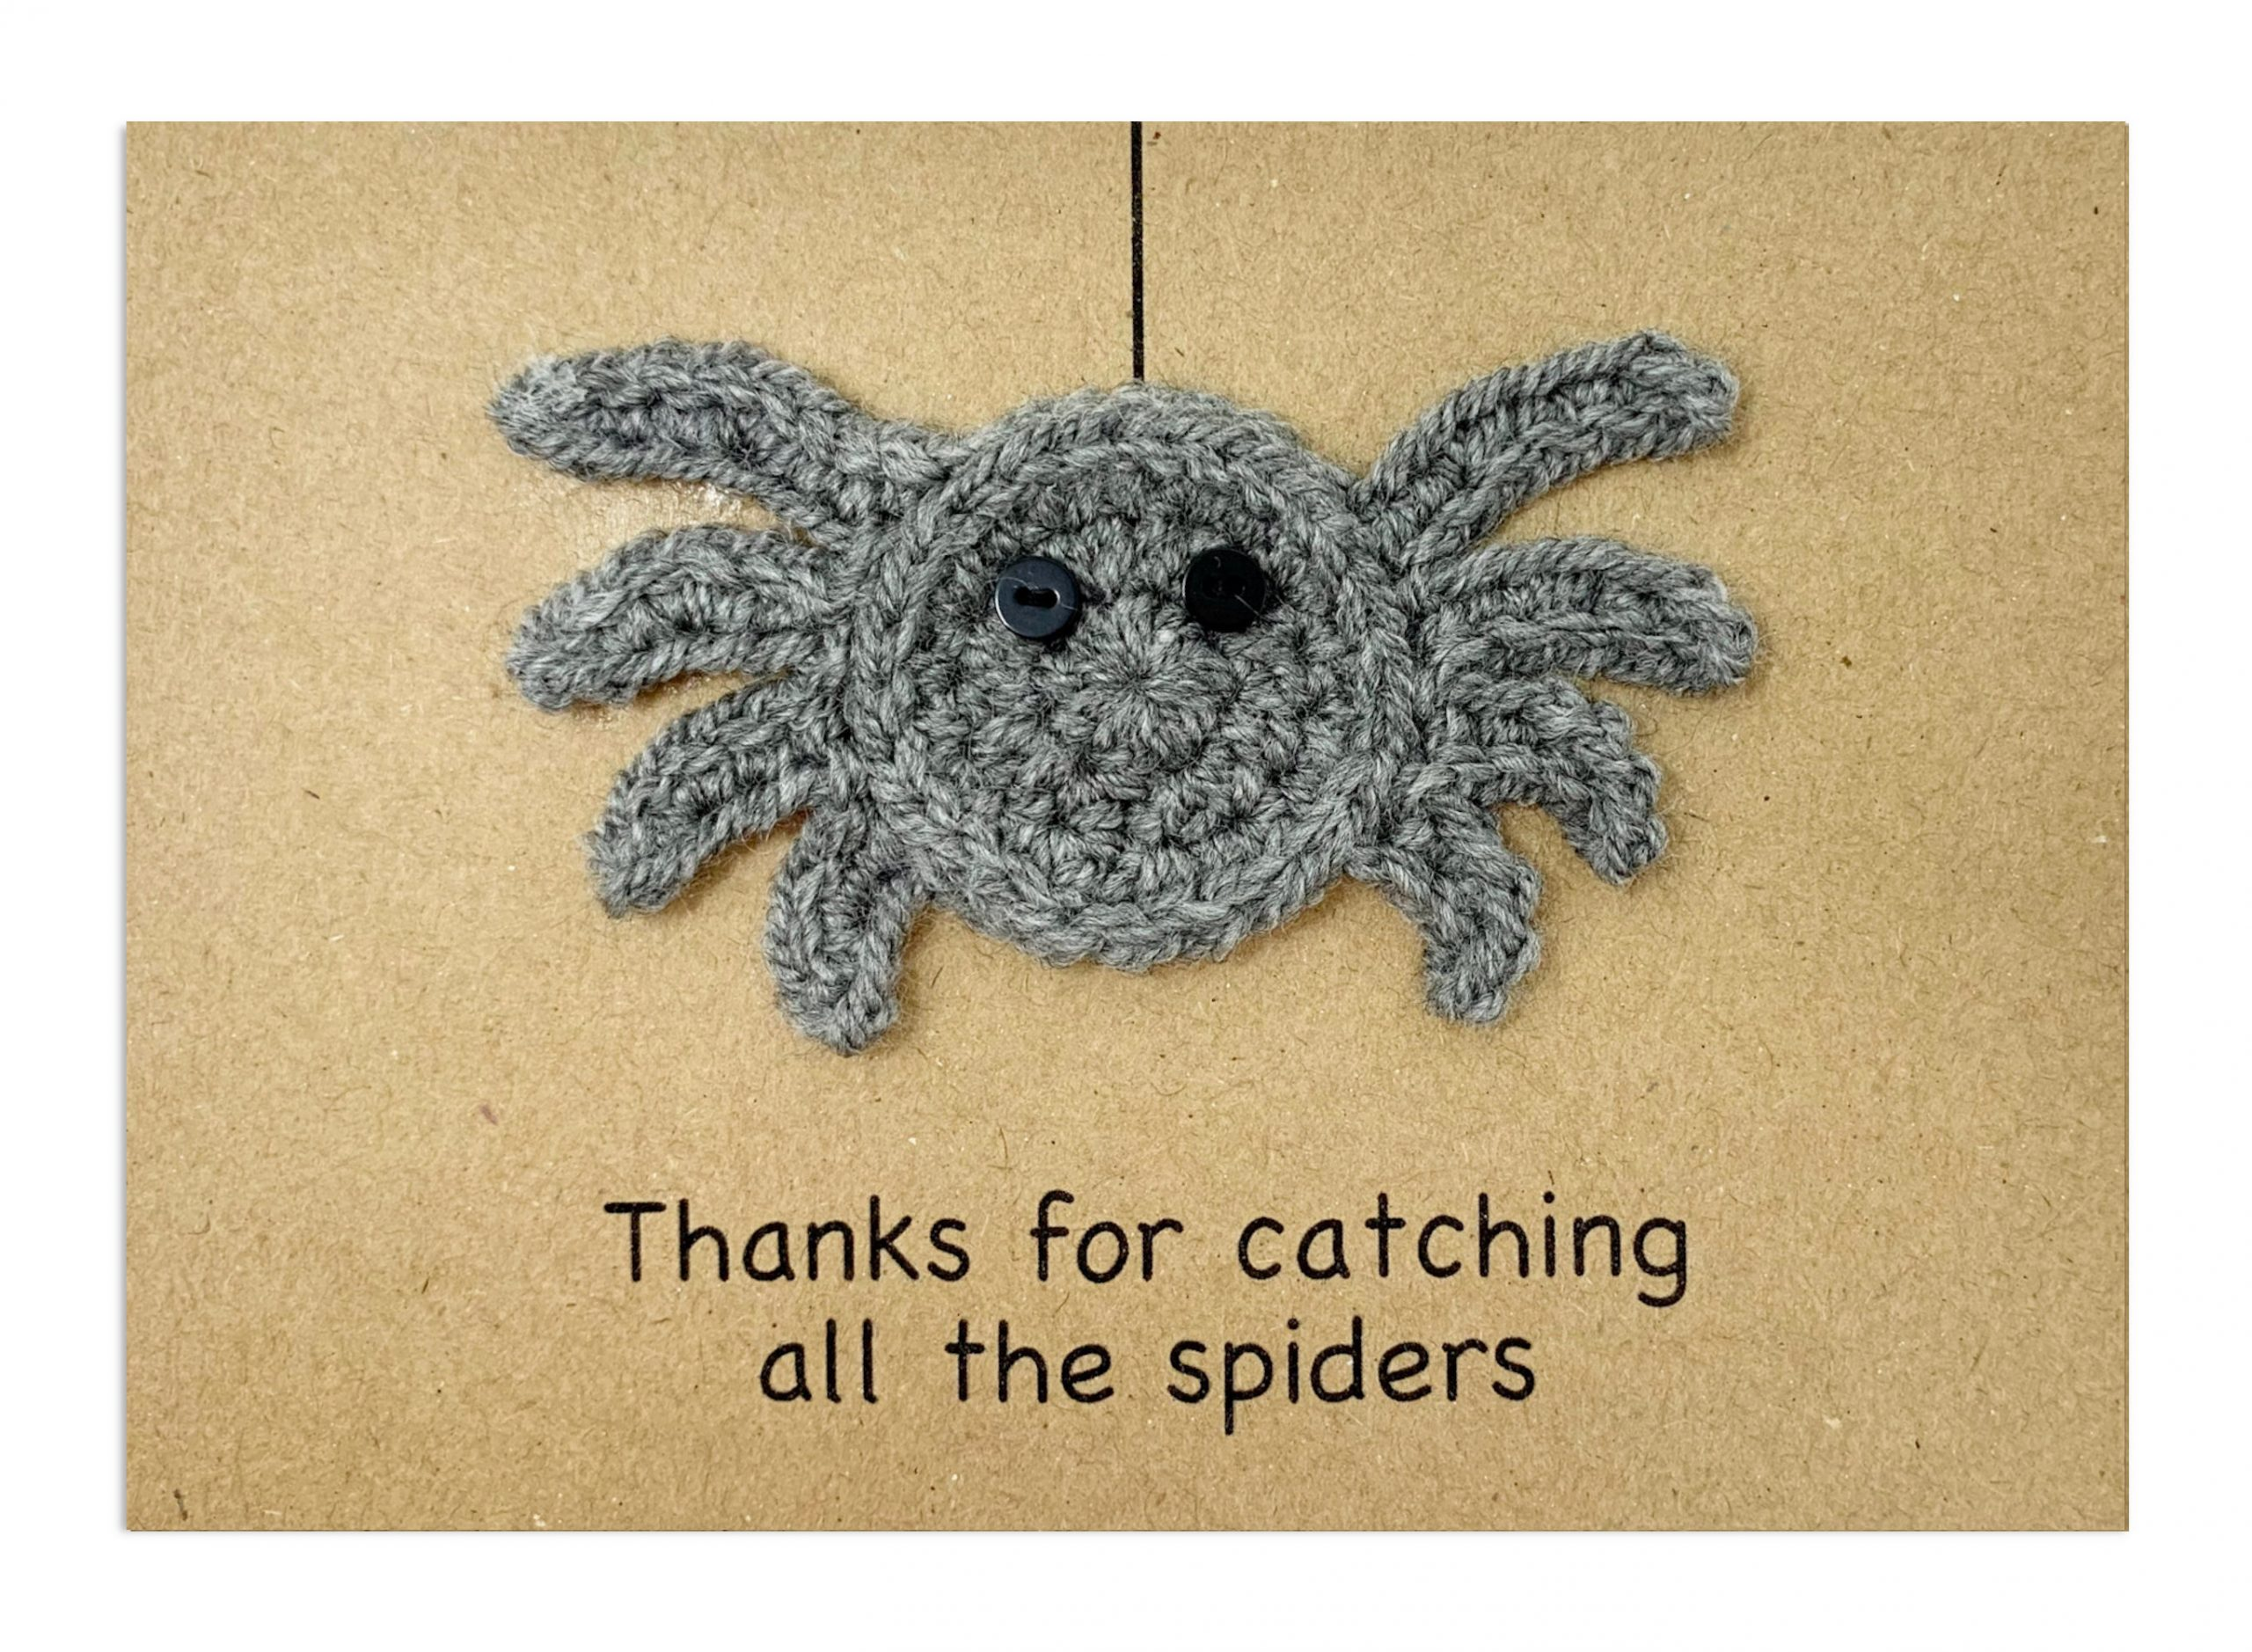 Spiders - edited